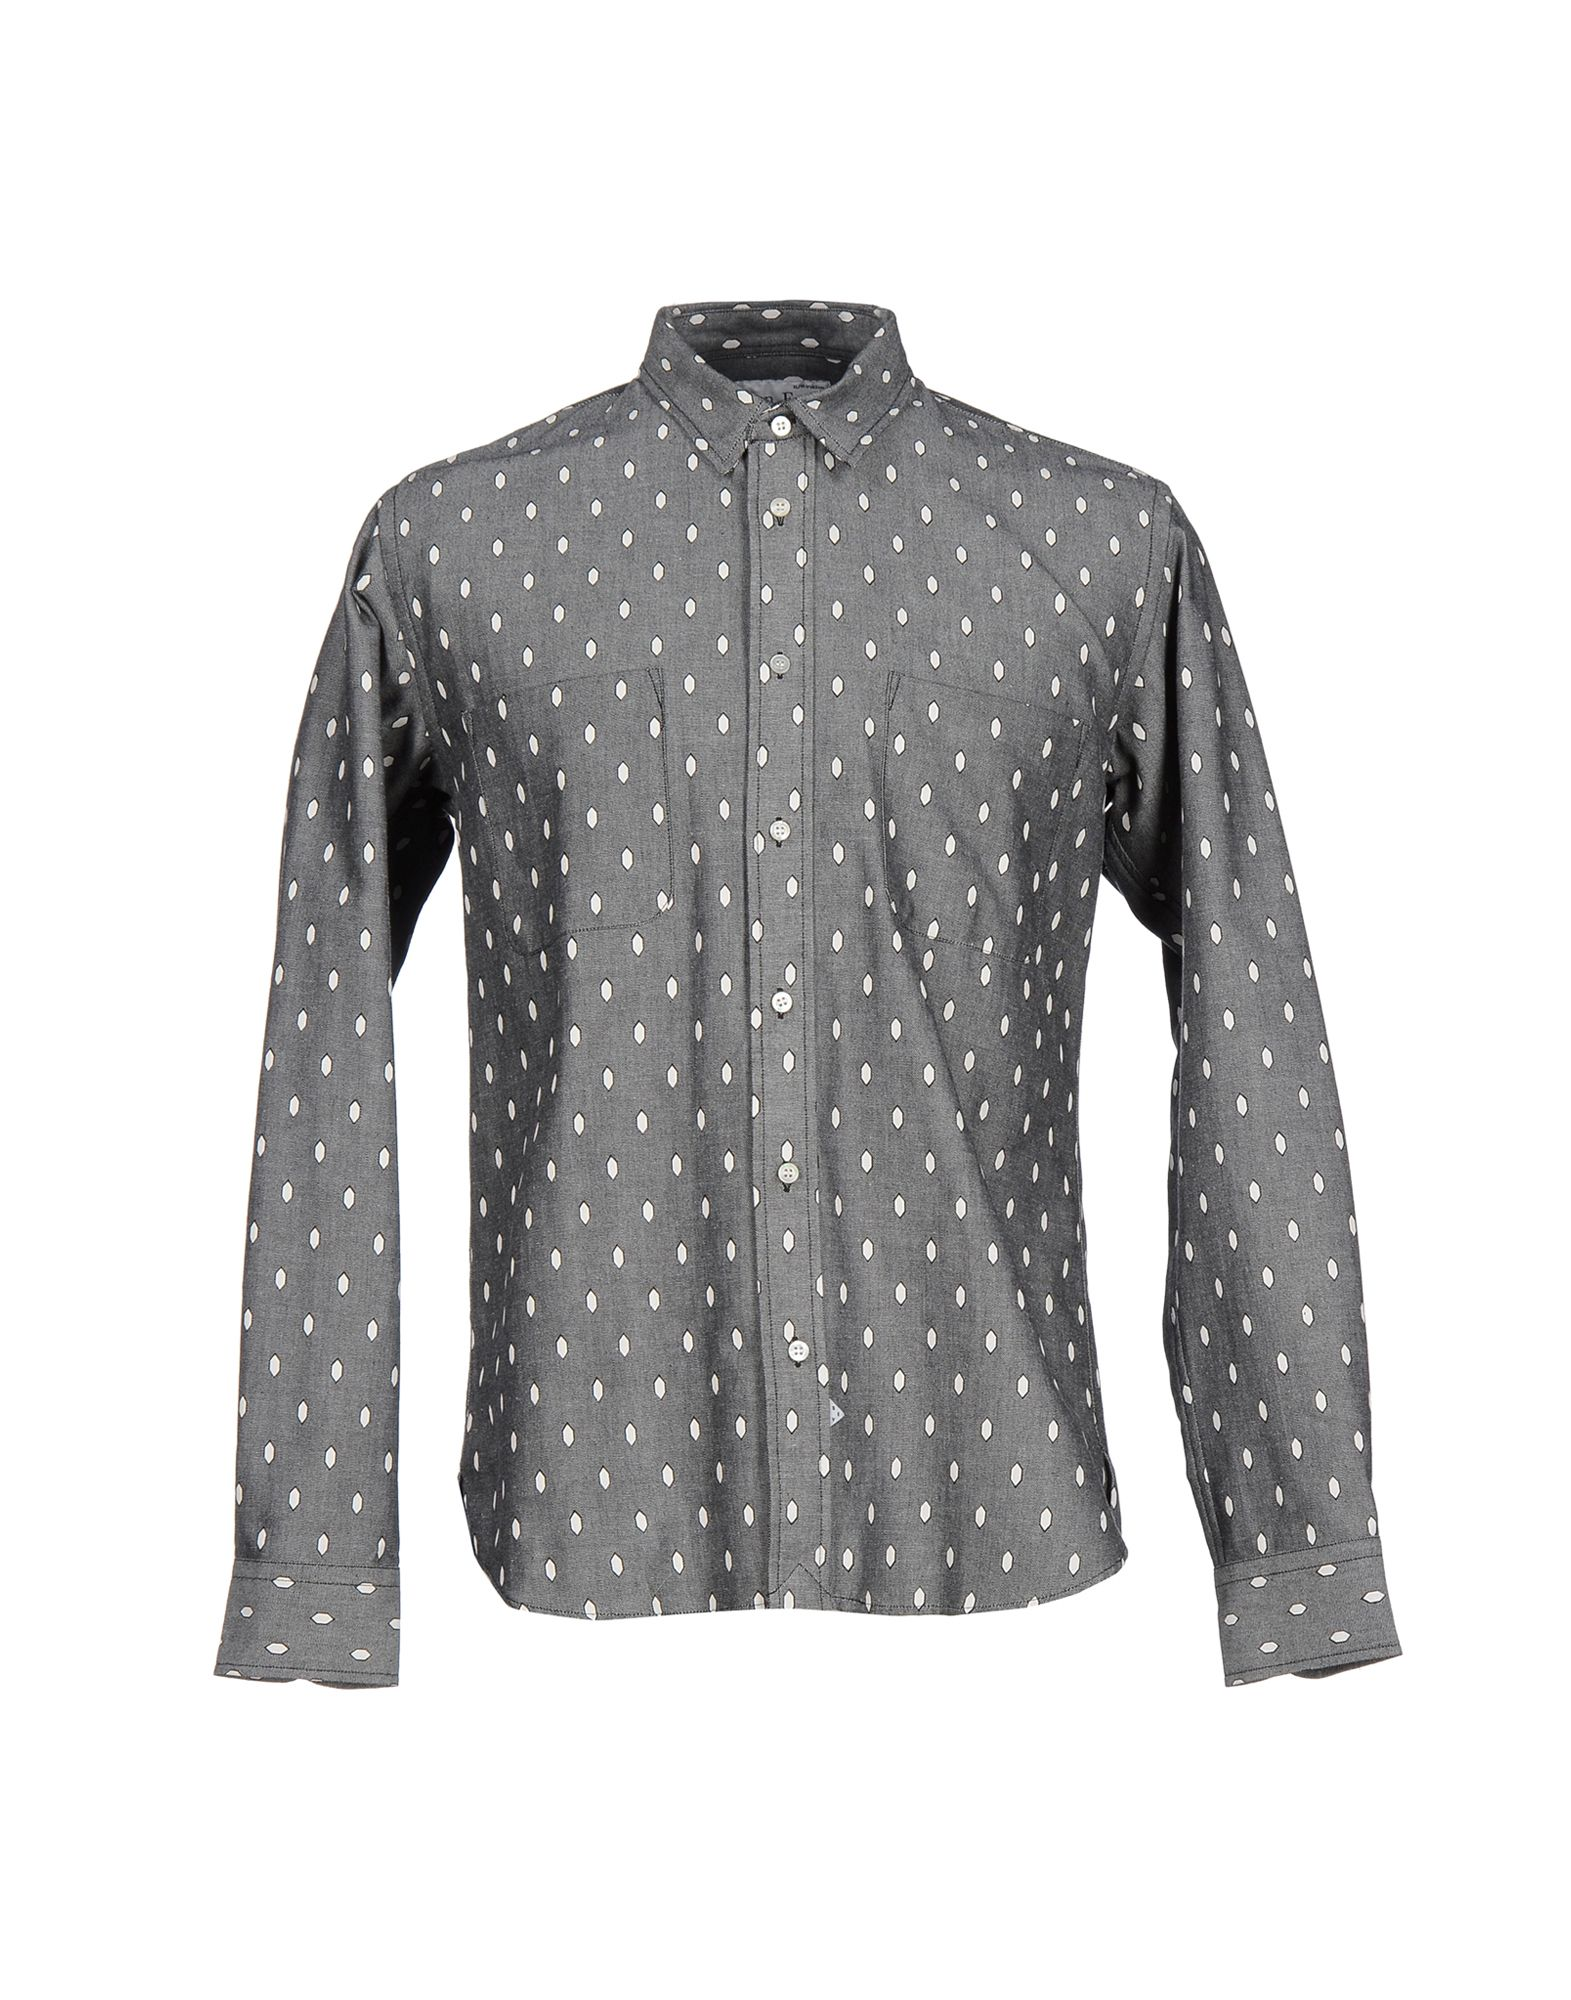 SIDIAN, ERSATZ & VANES Patterned Shirt in Grey